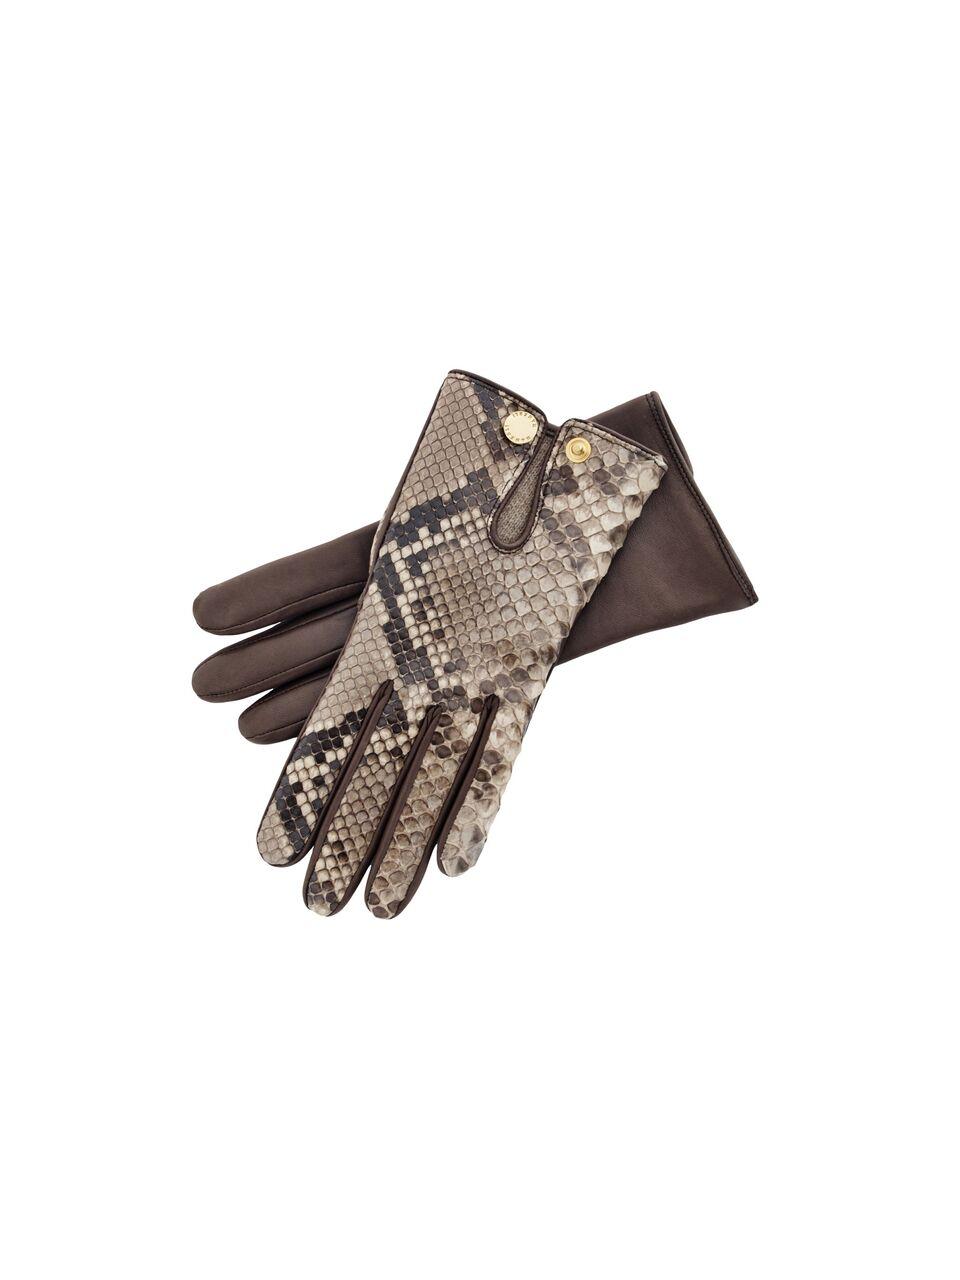 Pythone Leather Gloves Size 6.5